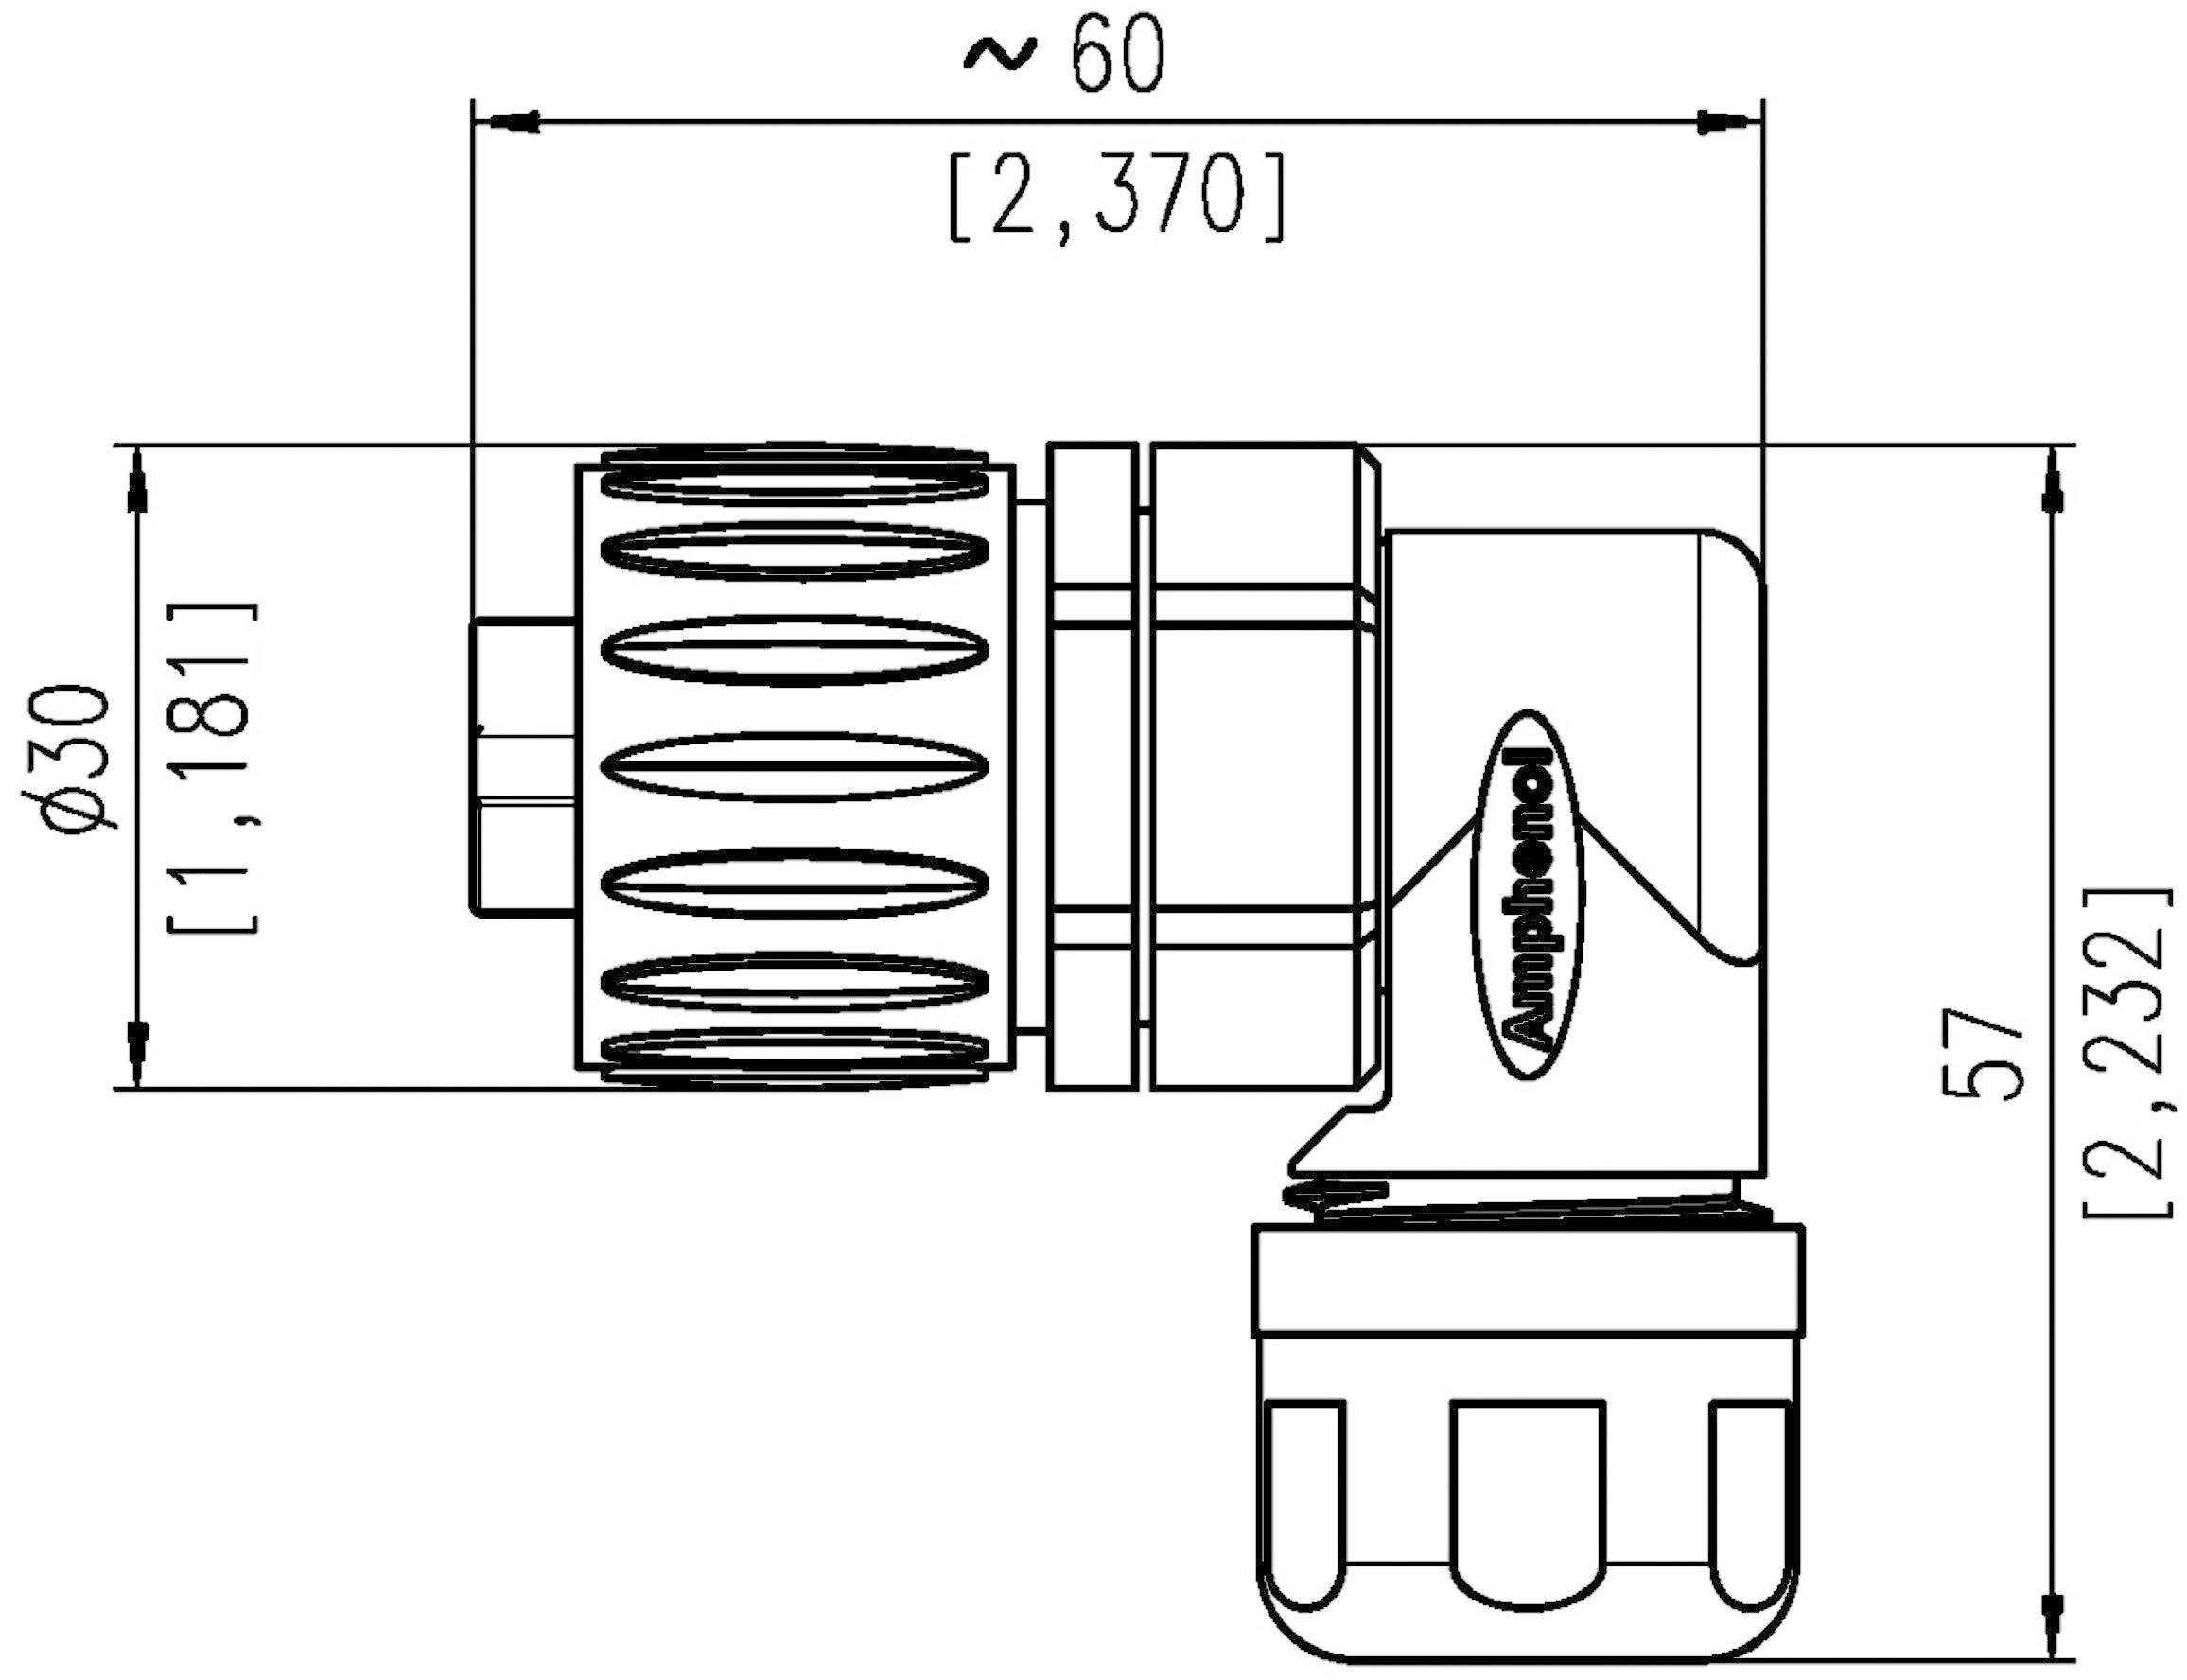 Amphenol C016 20F003 100 10 IP67 (v zablokovanom stave), polyamid 6.6, pólů + PE, 1 ks